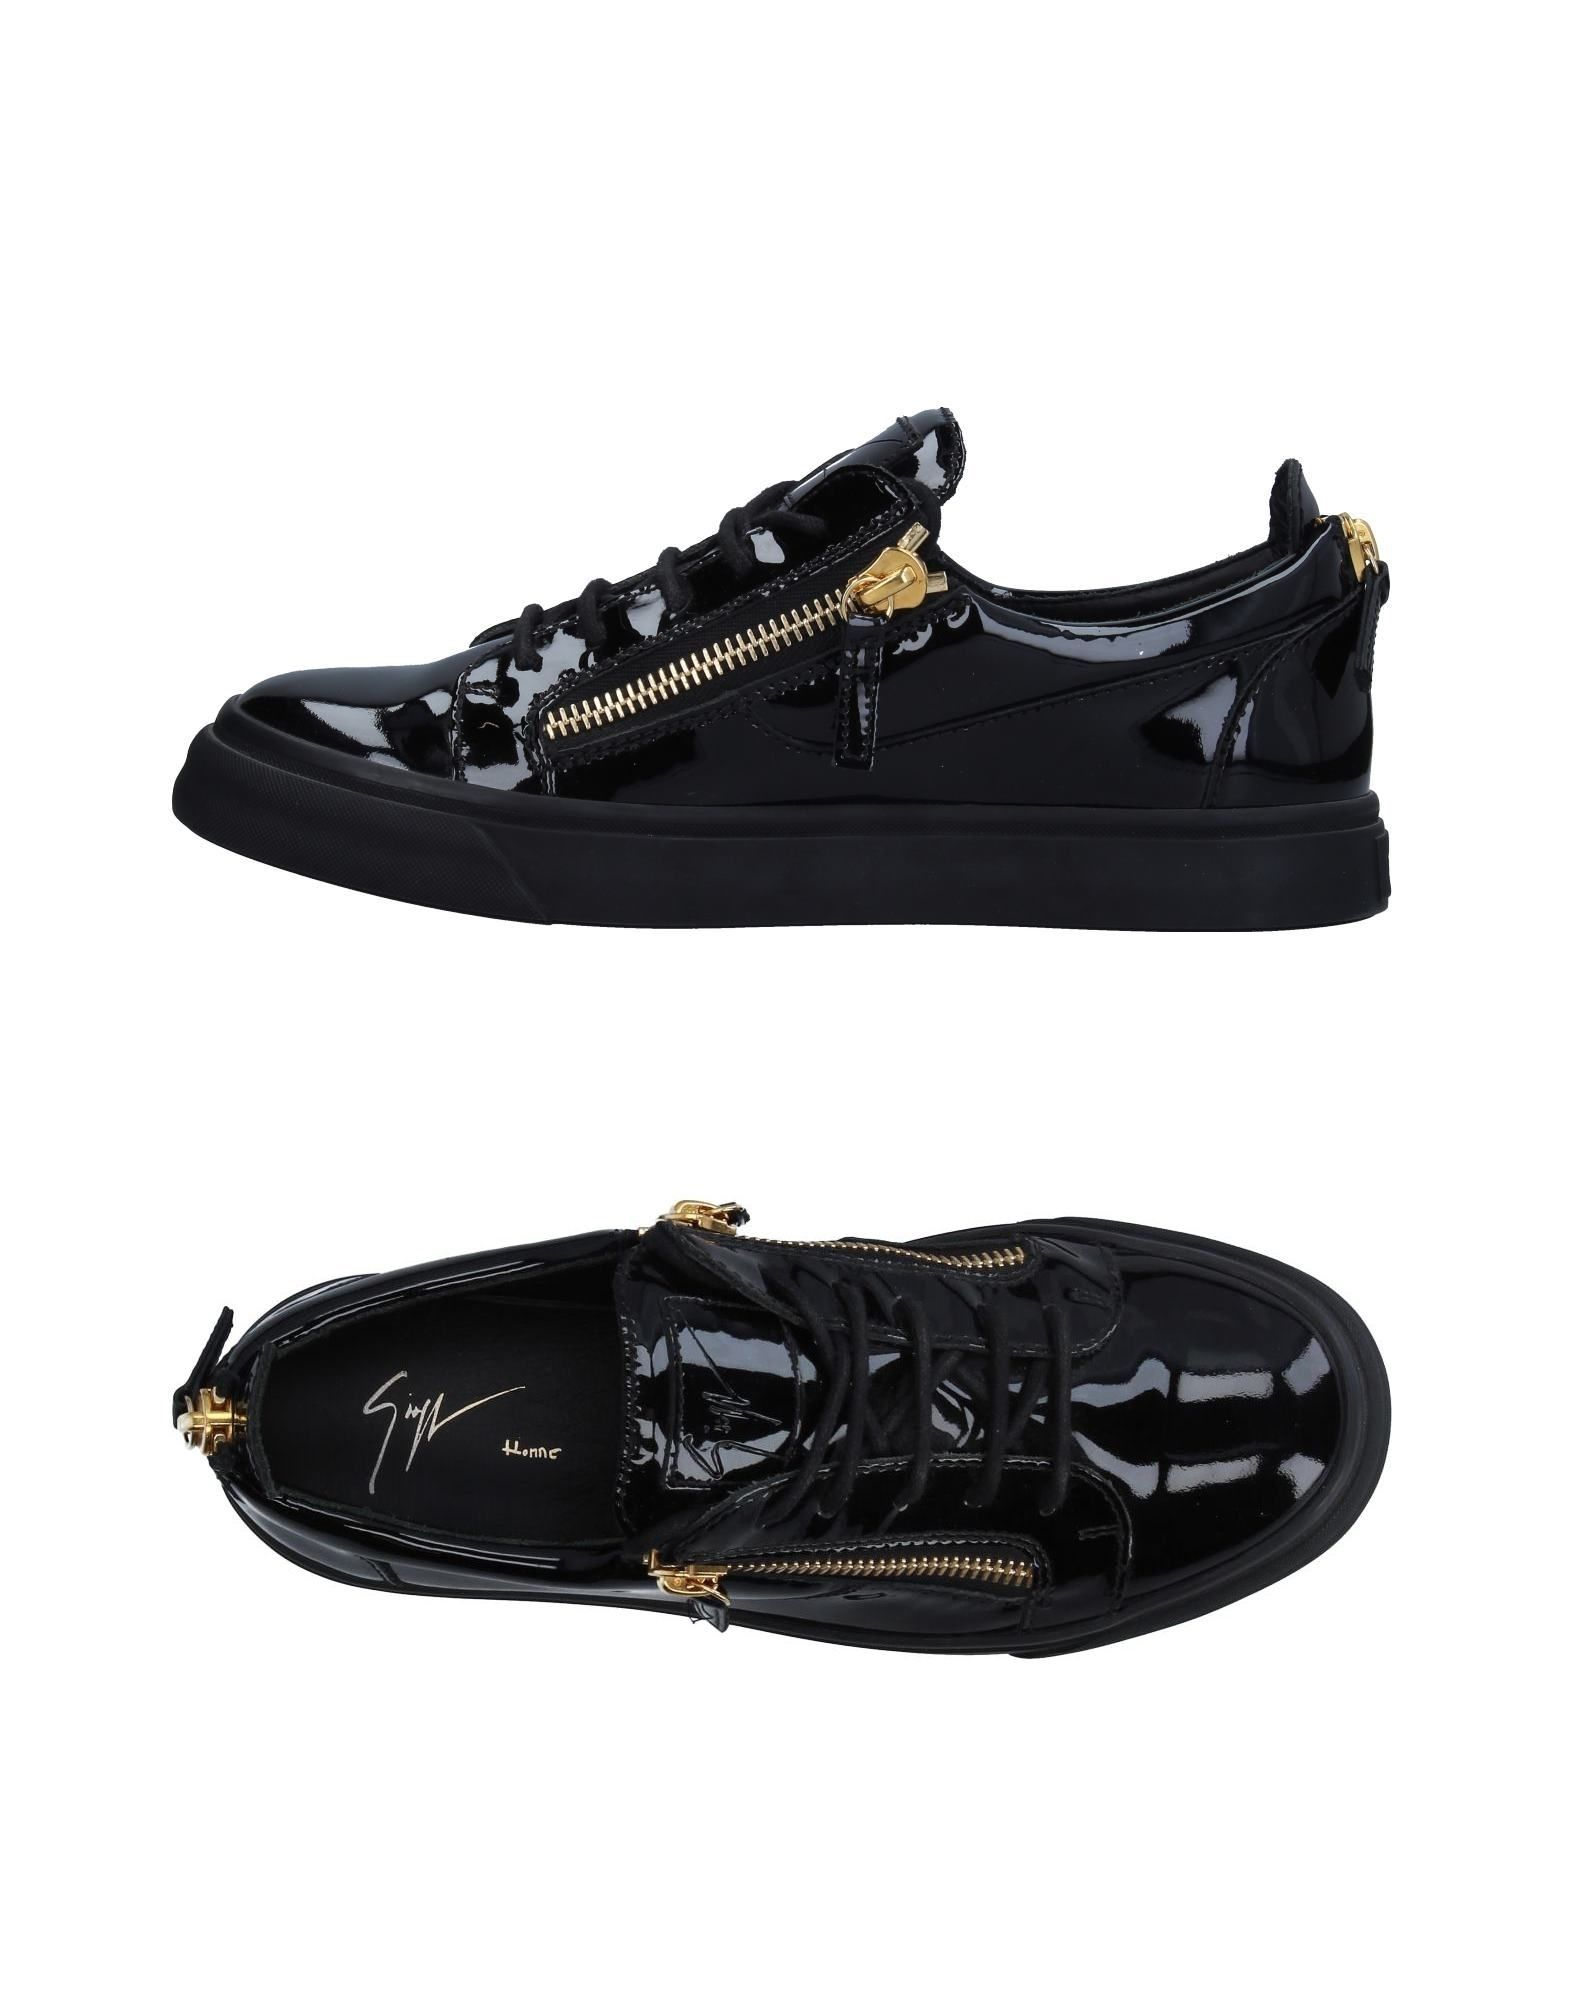 GIUSEPPE ZANOTTI DESIGN Herren Low Sneakers & Tennisschuhe Farbe Schwarz Größe 6